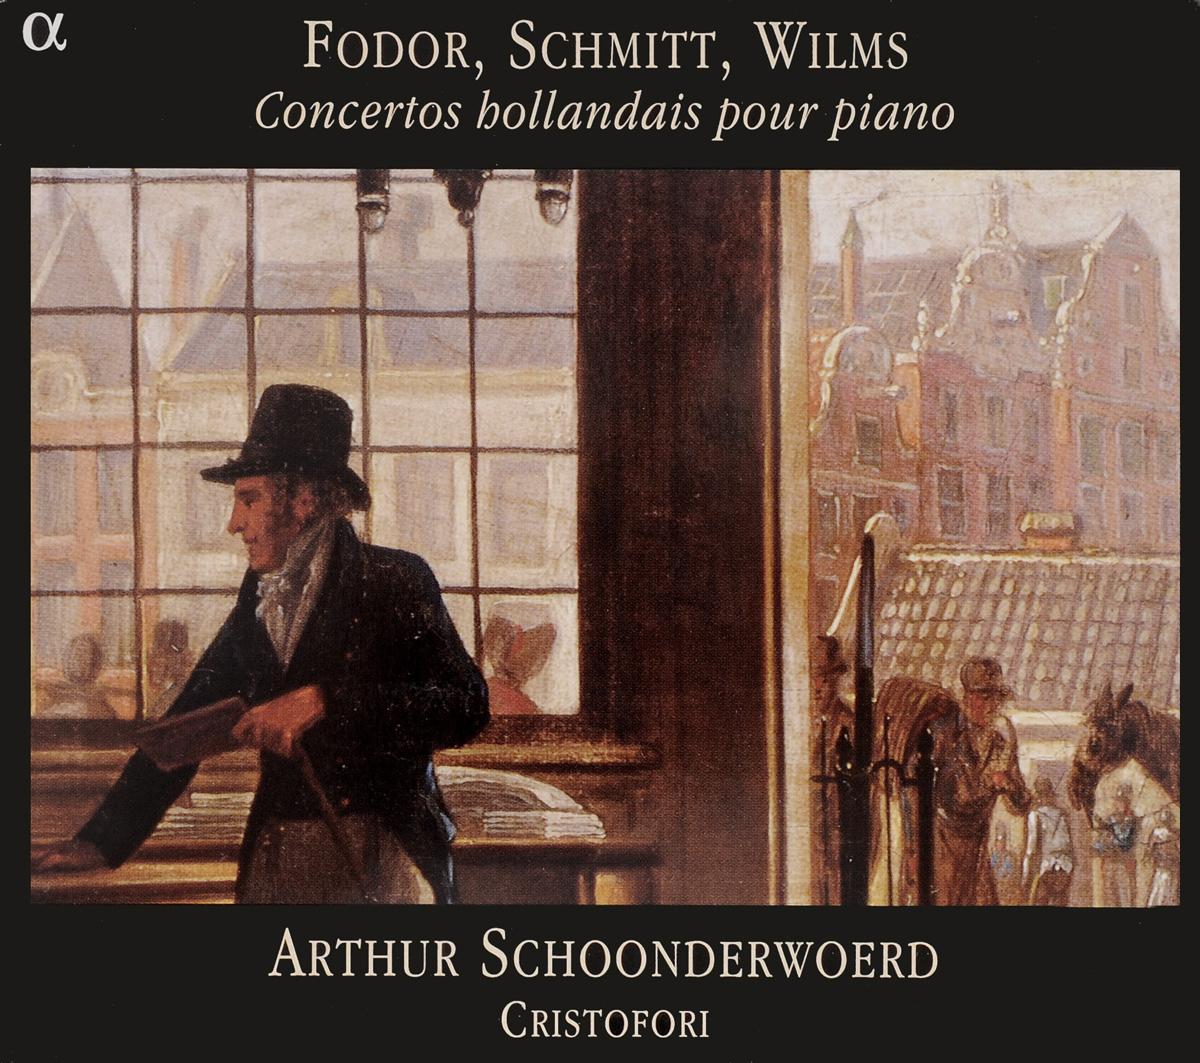 Fodor / Schmitt / Wilms - Arthur Schoonderwoerd, Cristofori. Concertos Hollandais Pour Piano